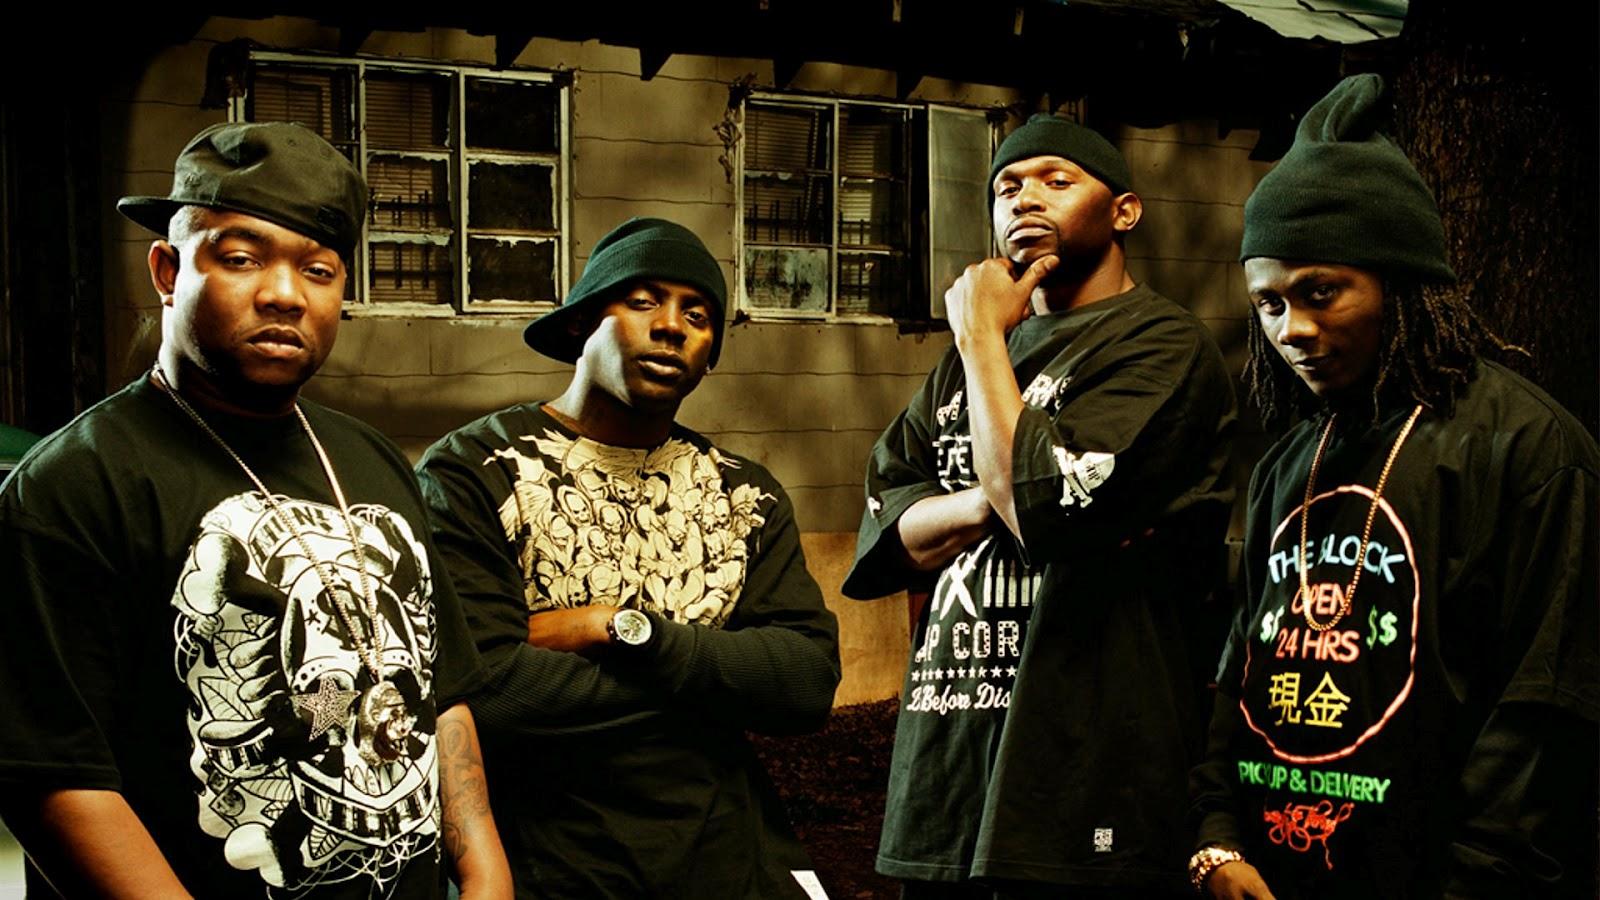 boyz n the hood gangsta rapper wallpaper 1600x900